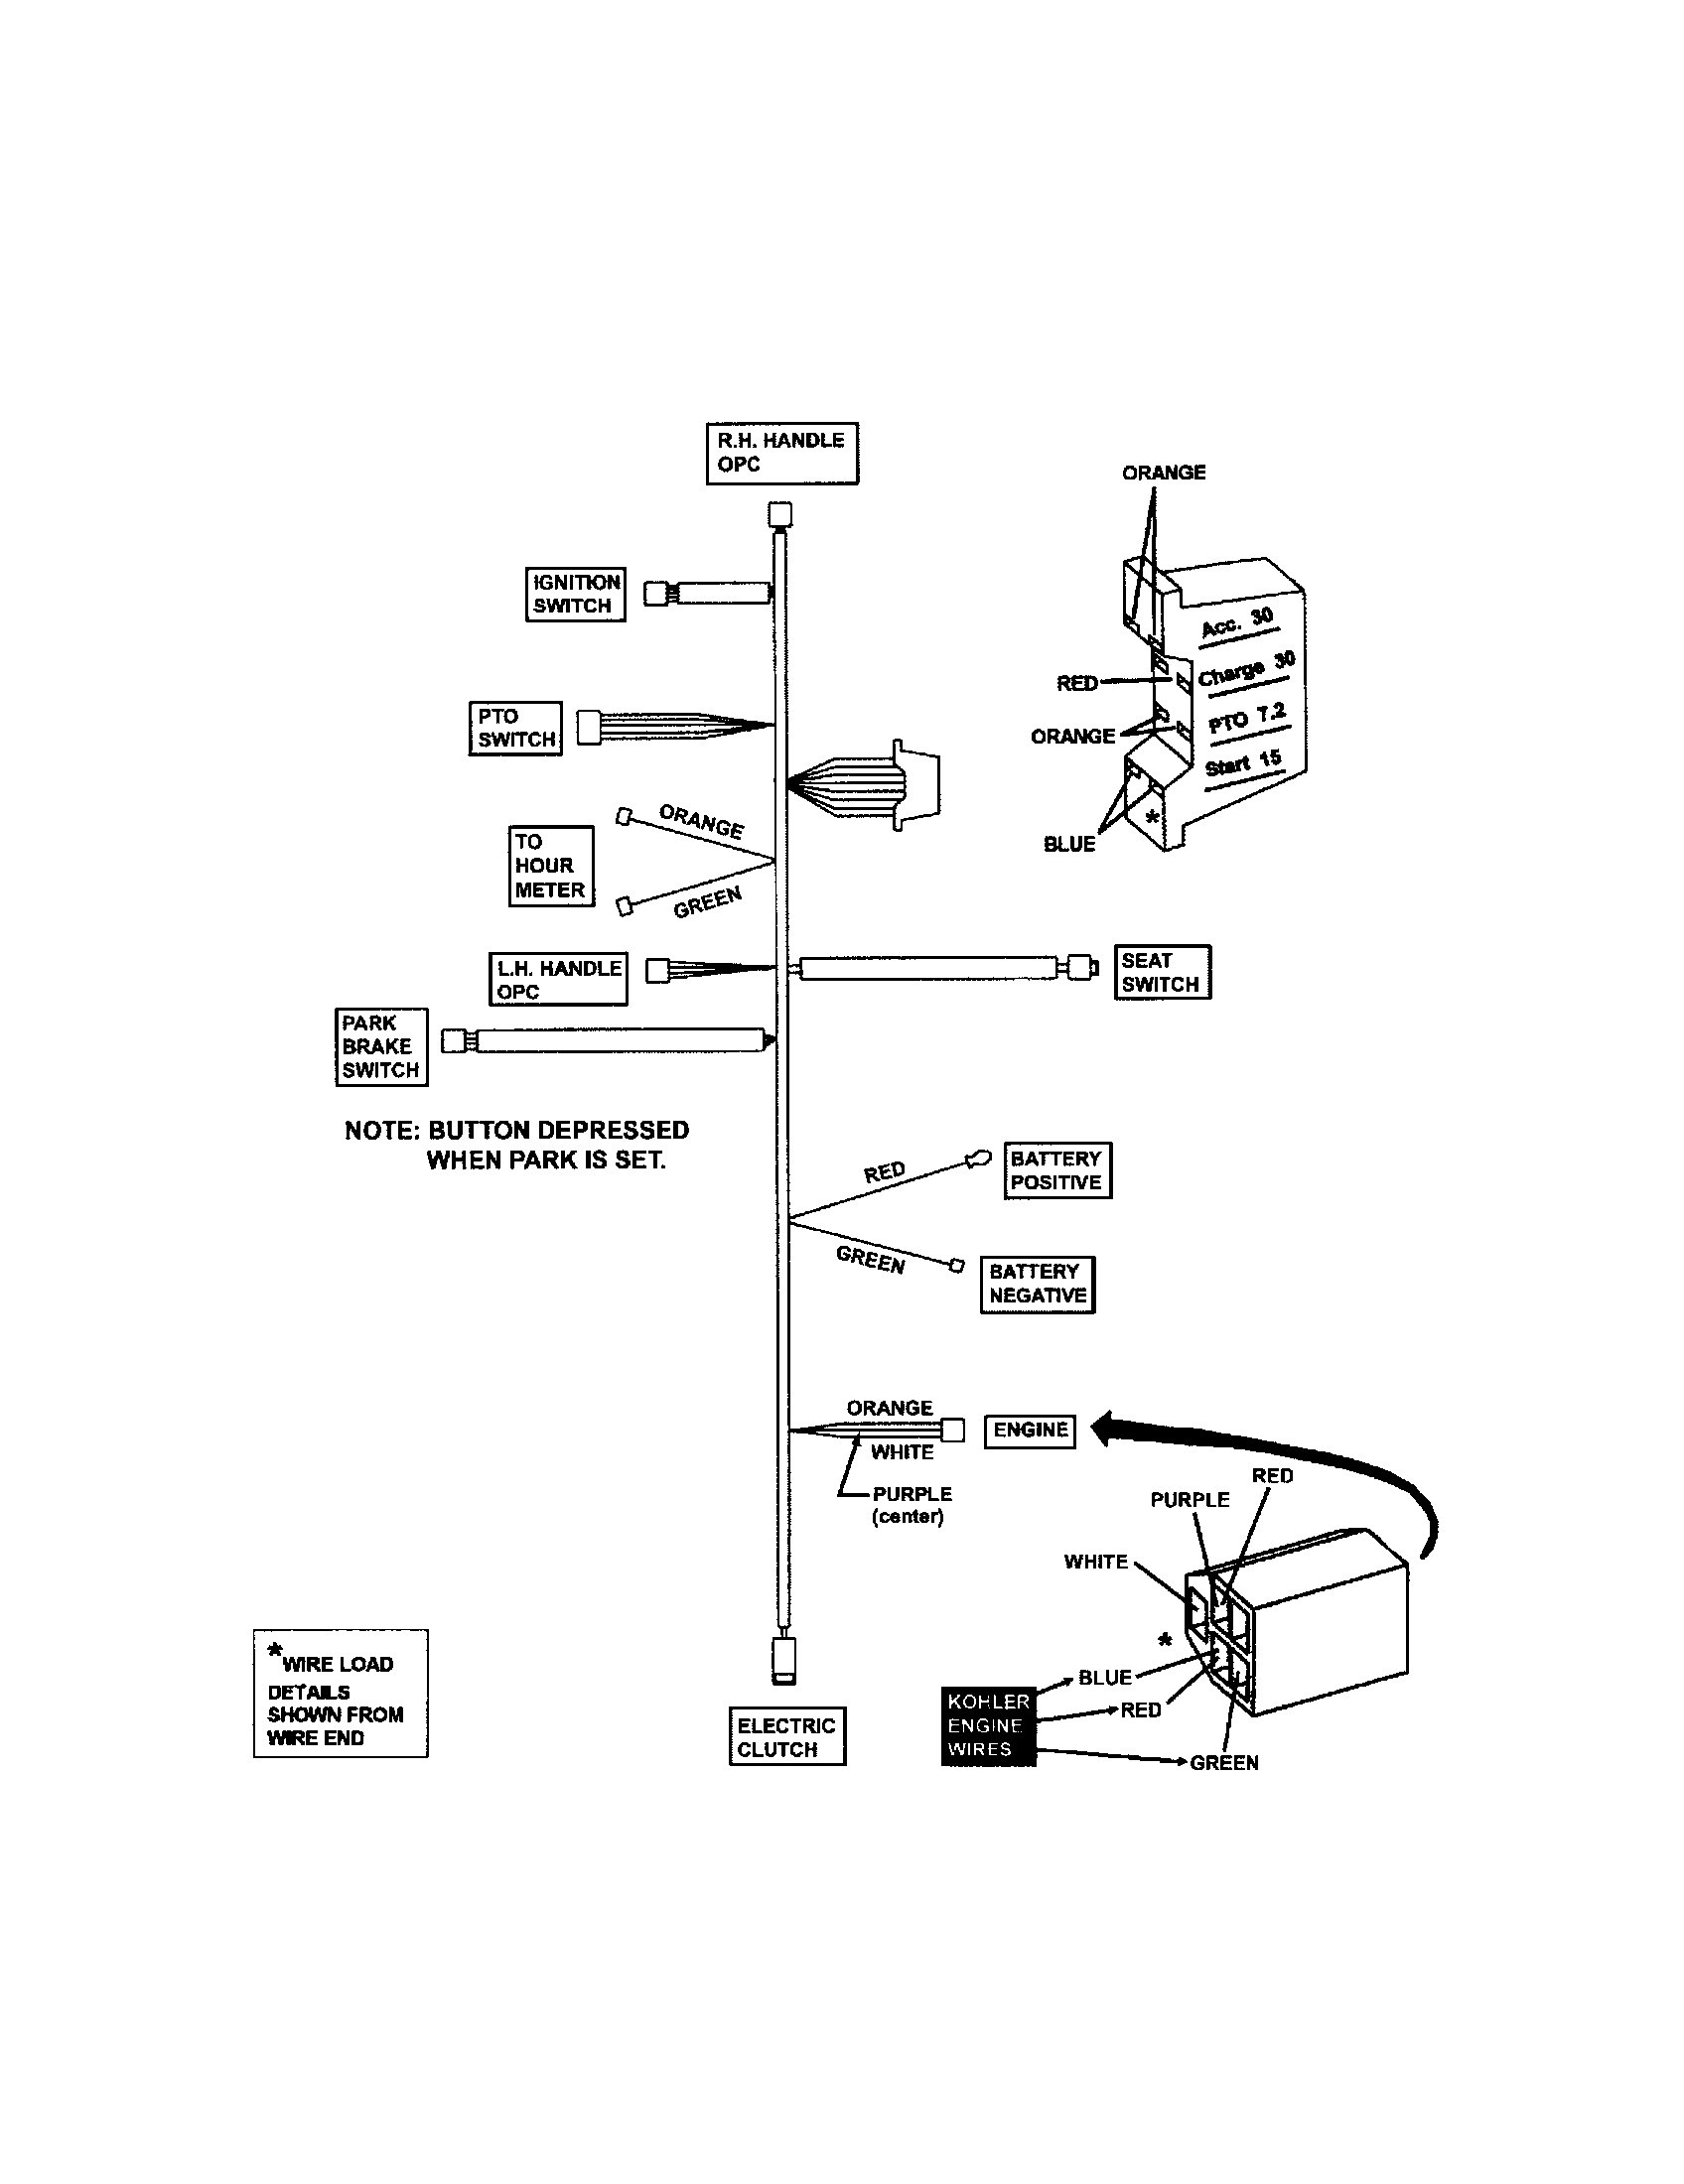 Snapper Lawn Mower 381450hbve User Gibson 355 Stereo Wiring Diagram